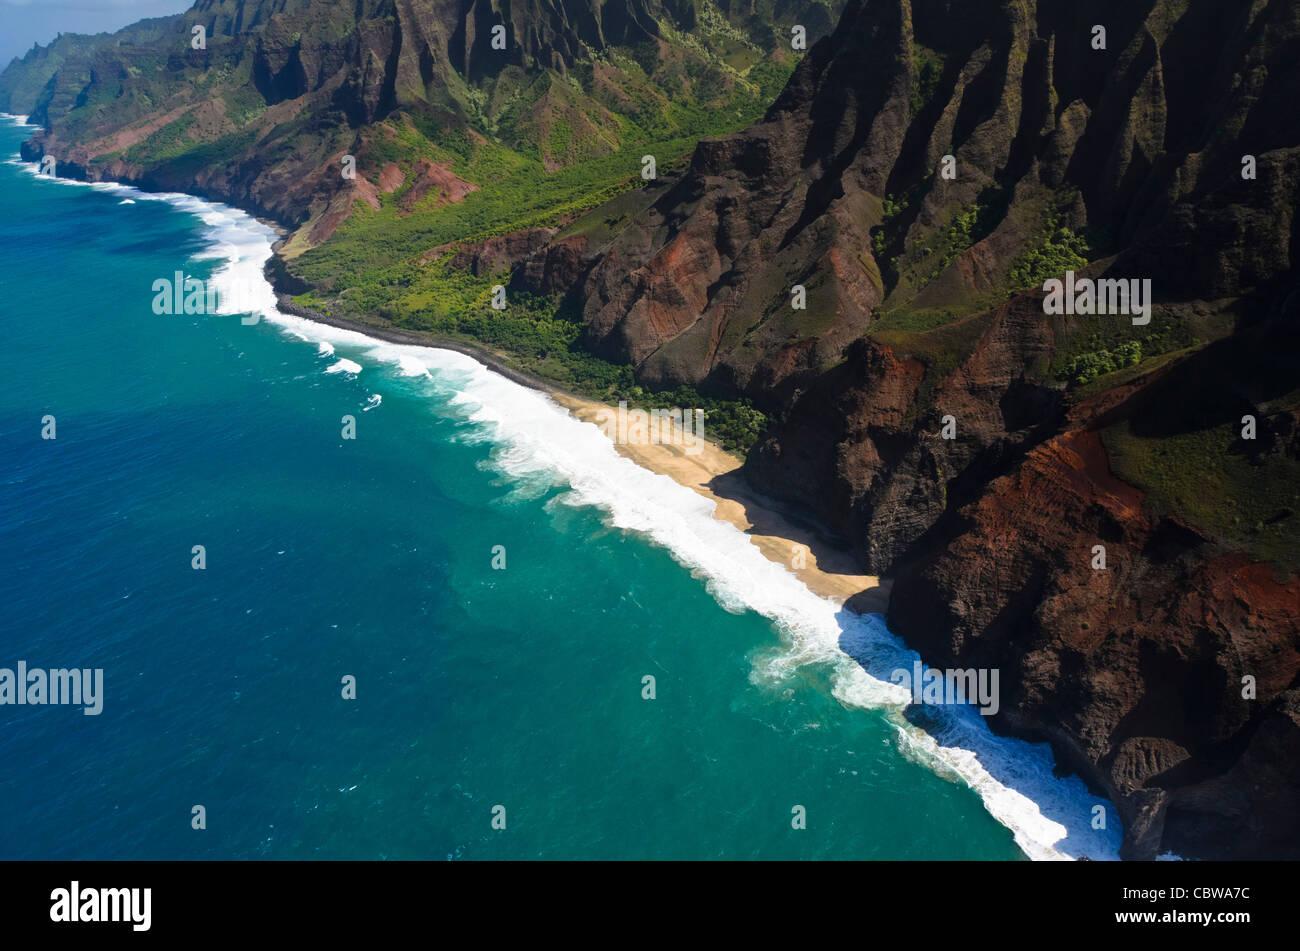 La costa di Na Pali dal cielo, Isola di Kauai, Hawaii, STATI UNITI D'AMERICA Immagini Stock